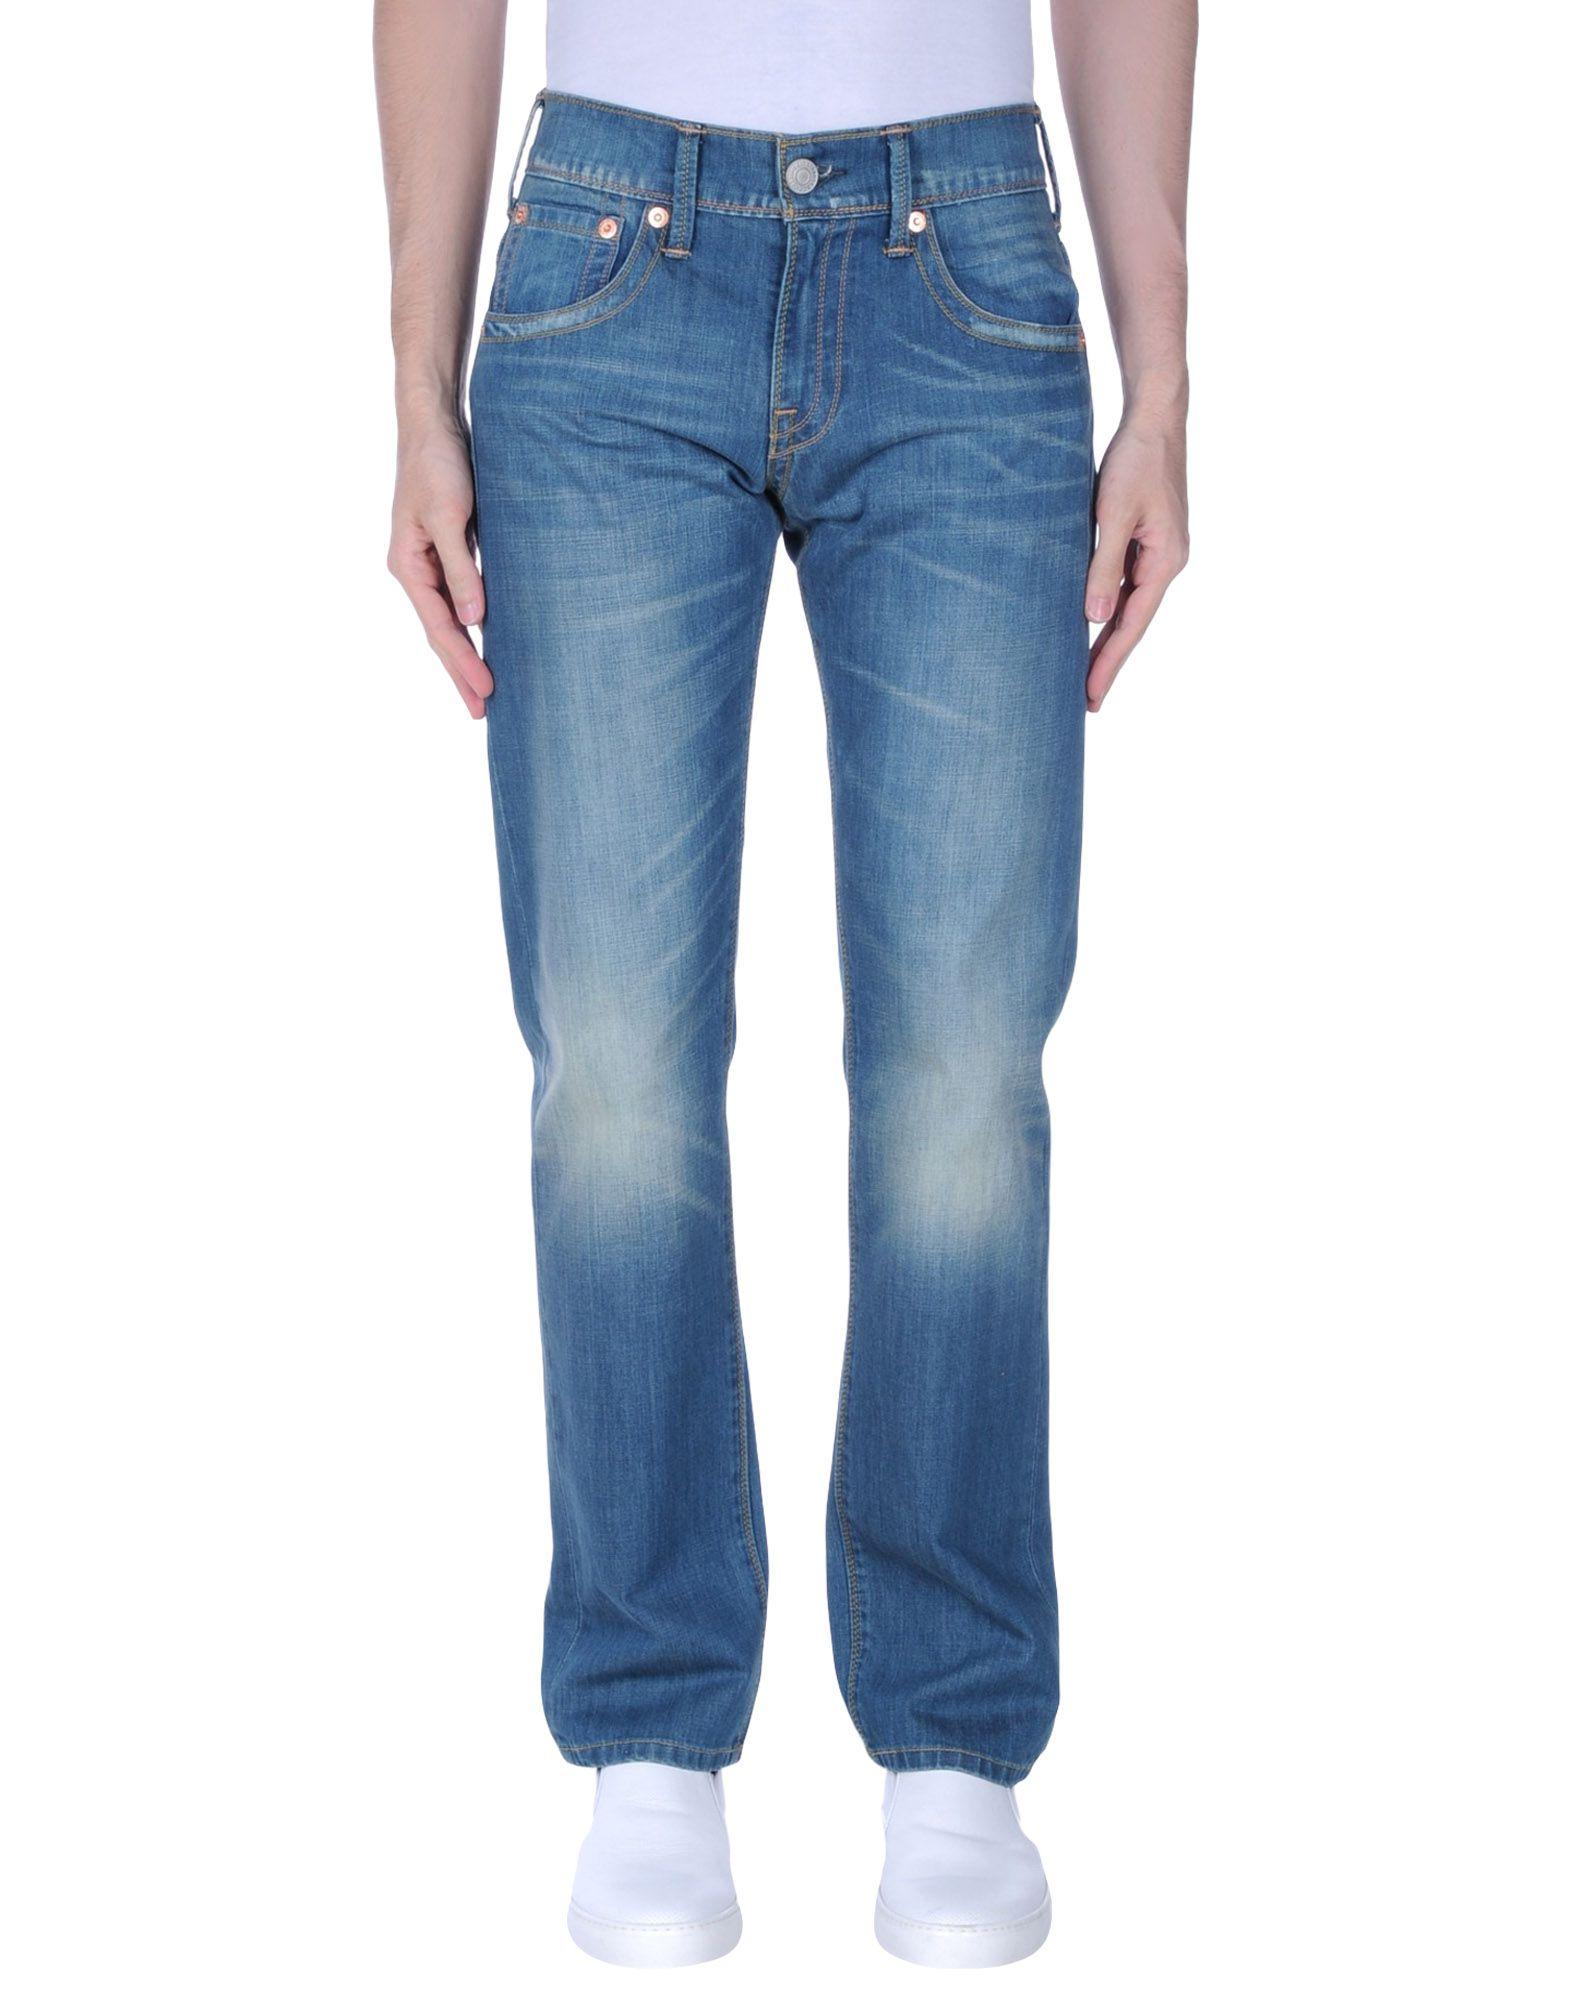 LEVI'S RED TAB Джинсовые брюки фен elchim 3900 healthy ionic red 03073 07